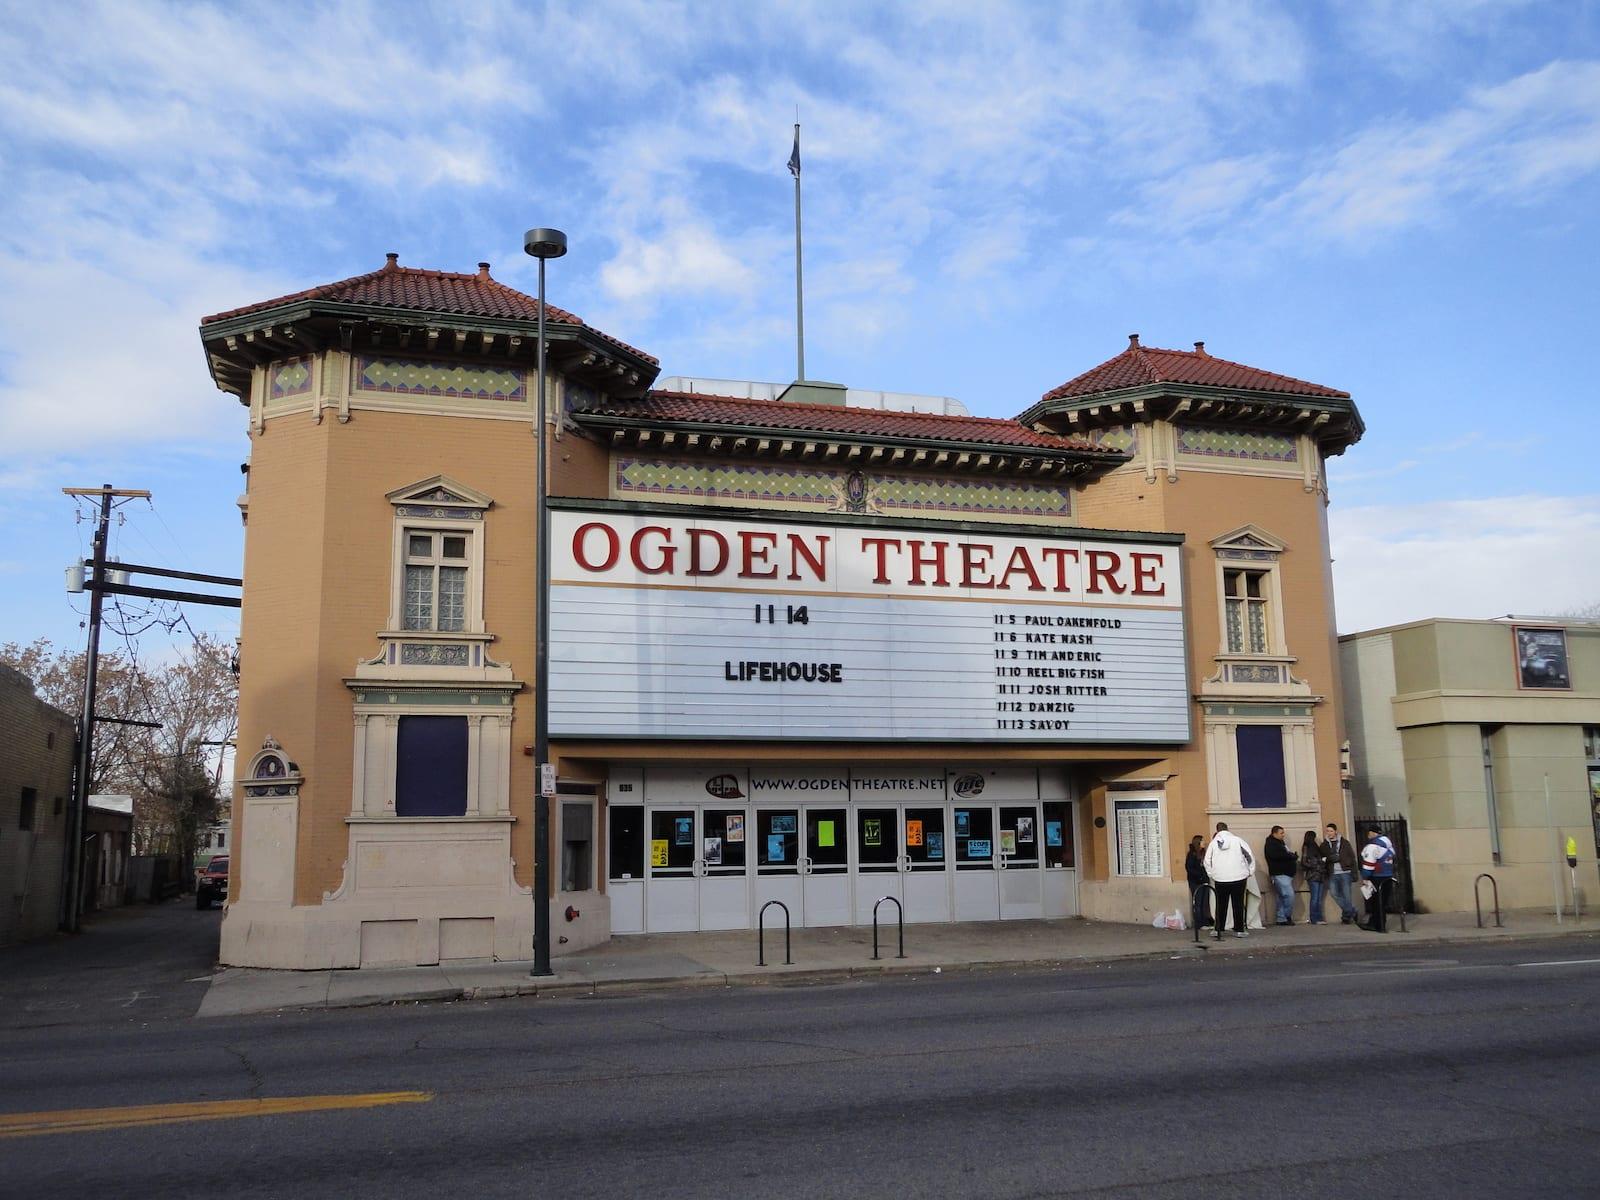 Ogden Theatre, Denver, Colorado